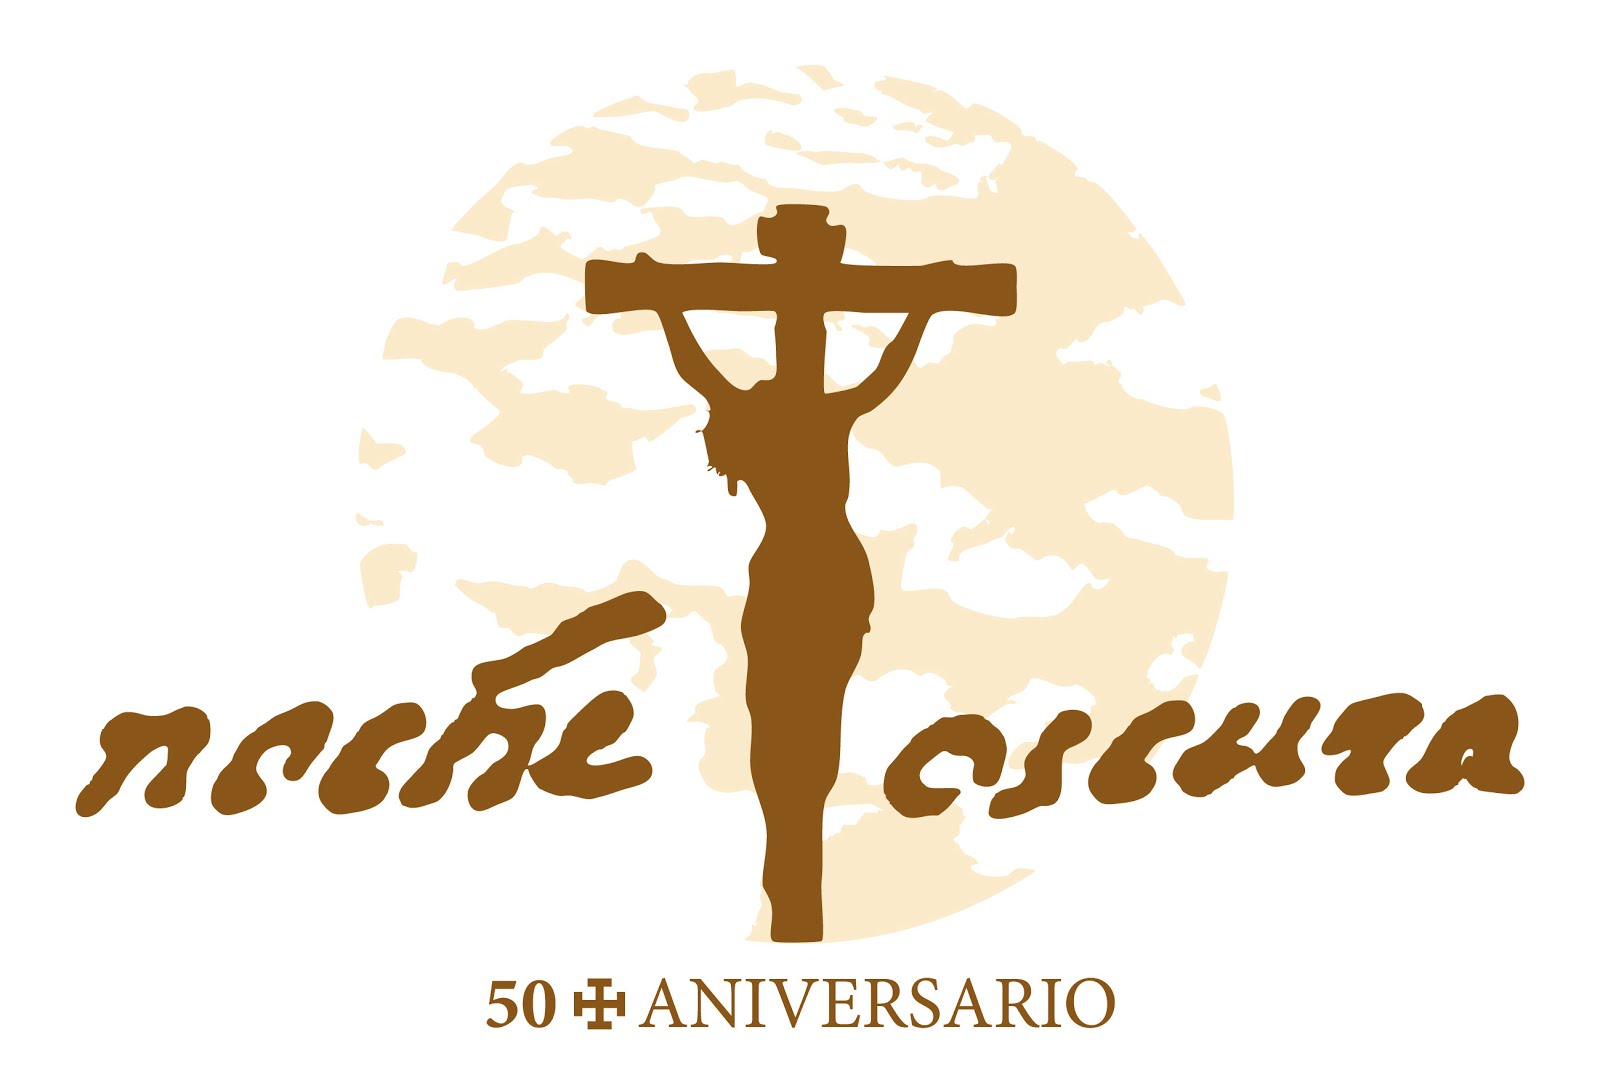 Logo Conmemorativo 50 Aniversario